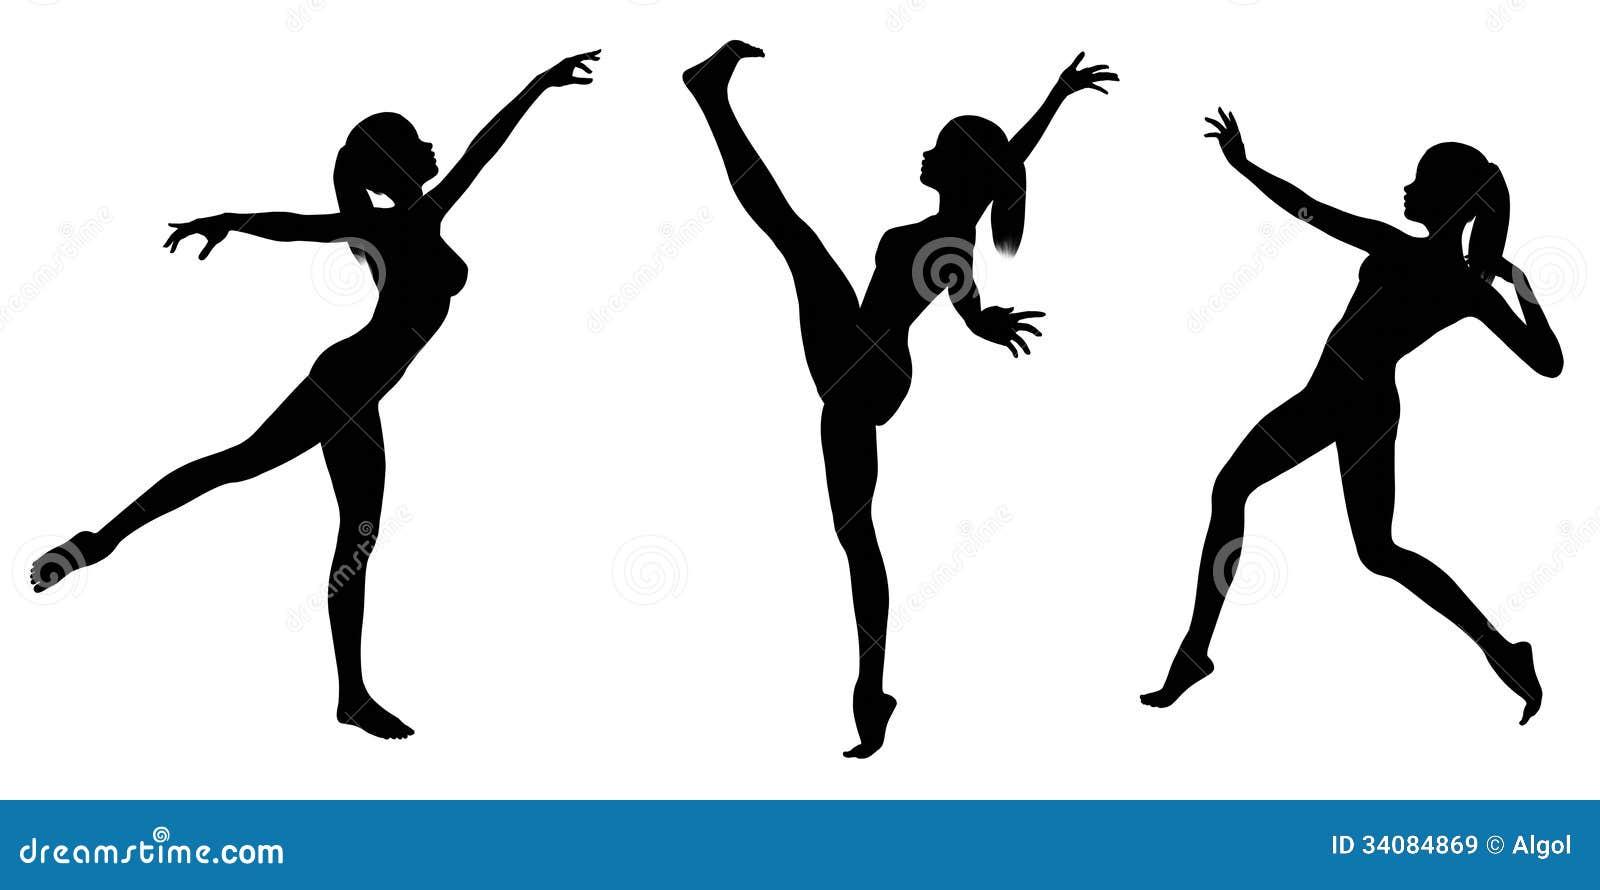 clip art gymnastics poses - photo #7